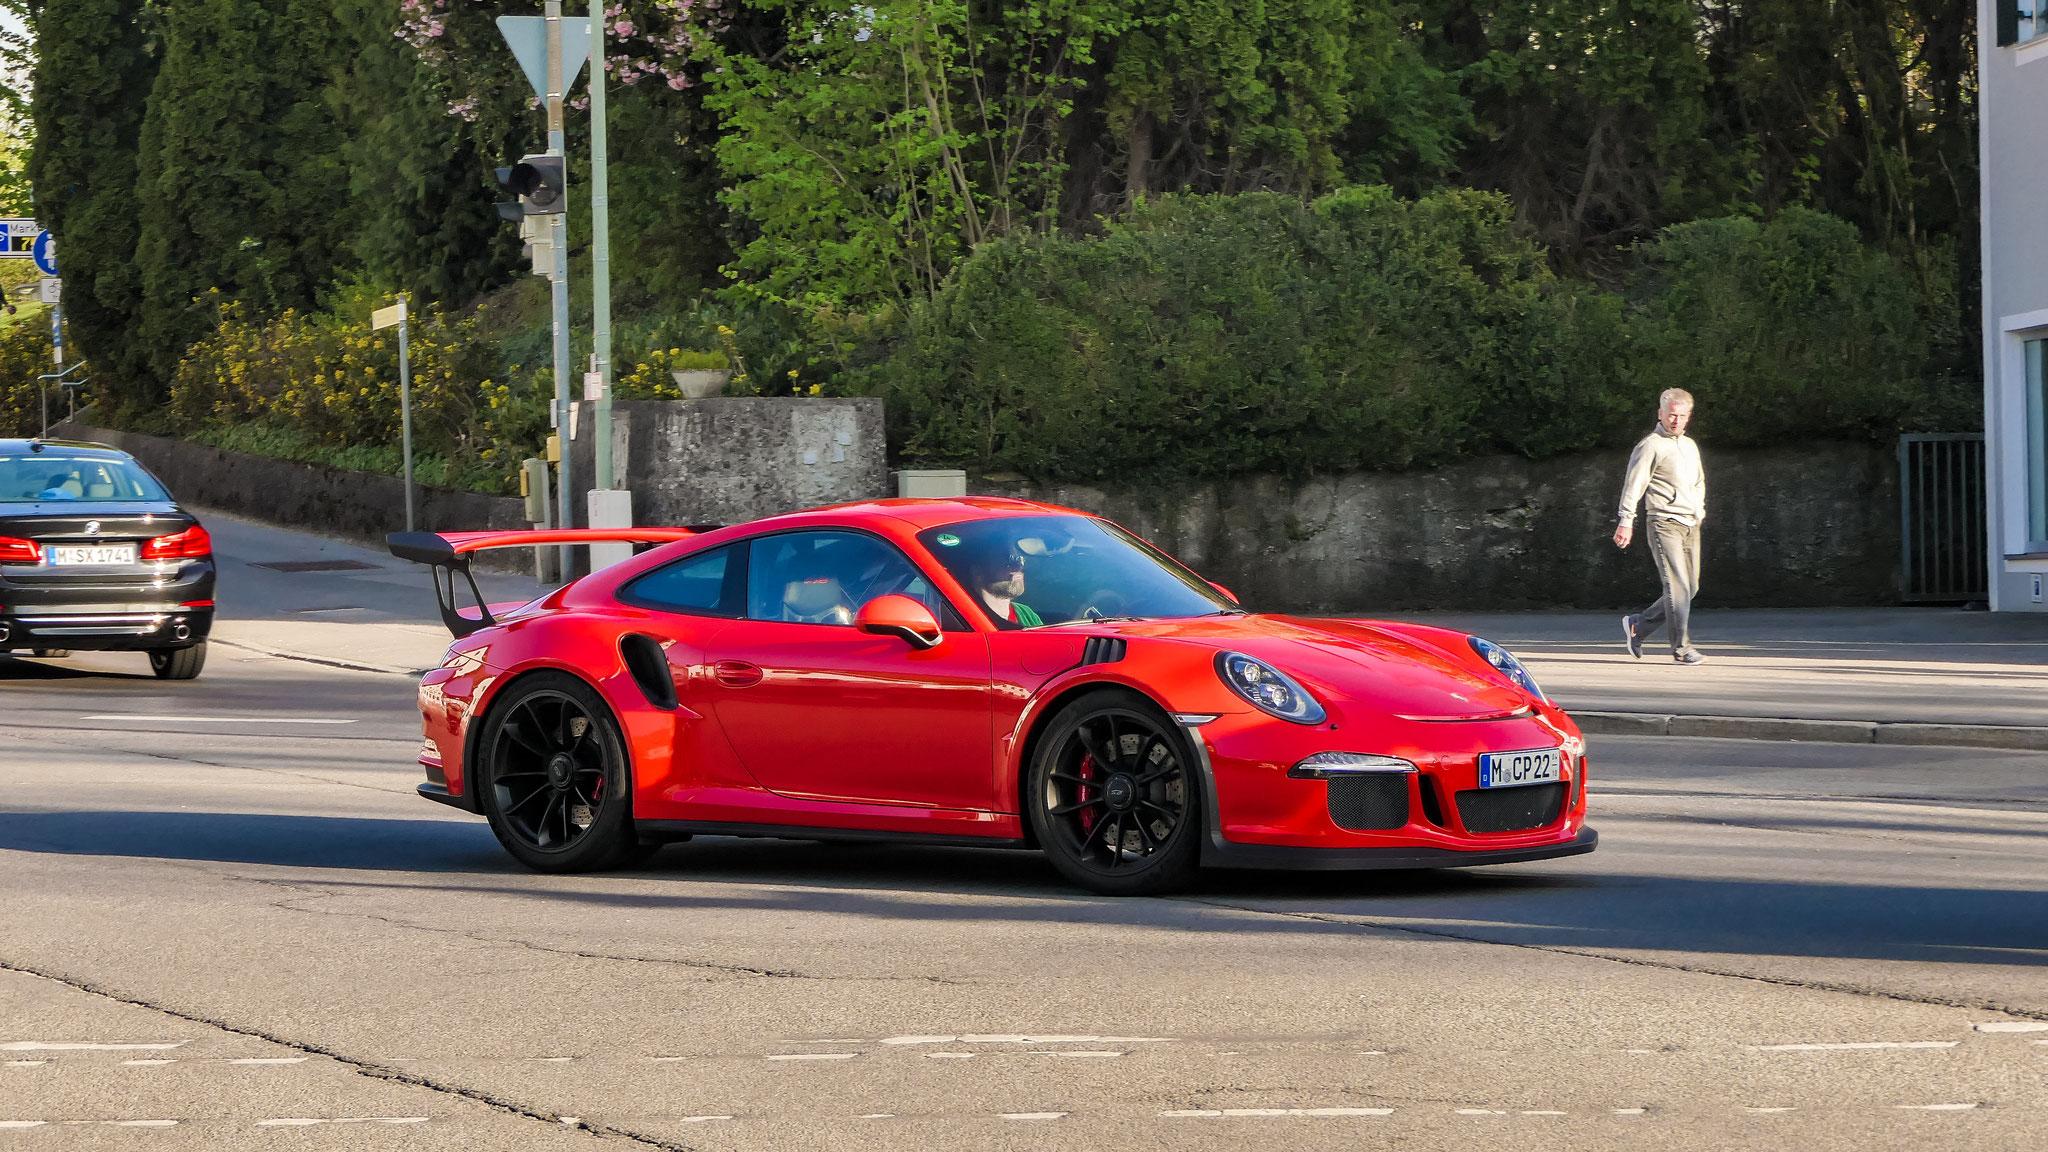 Porsche 911 GT3 RS - M-CP-22